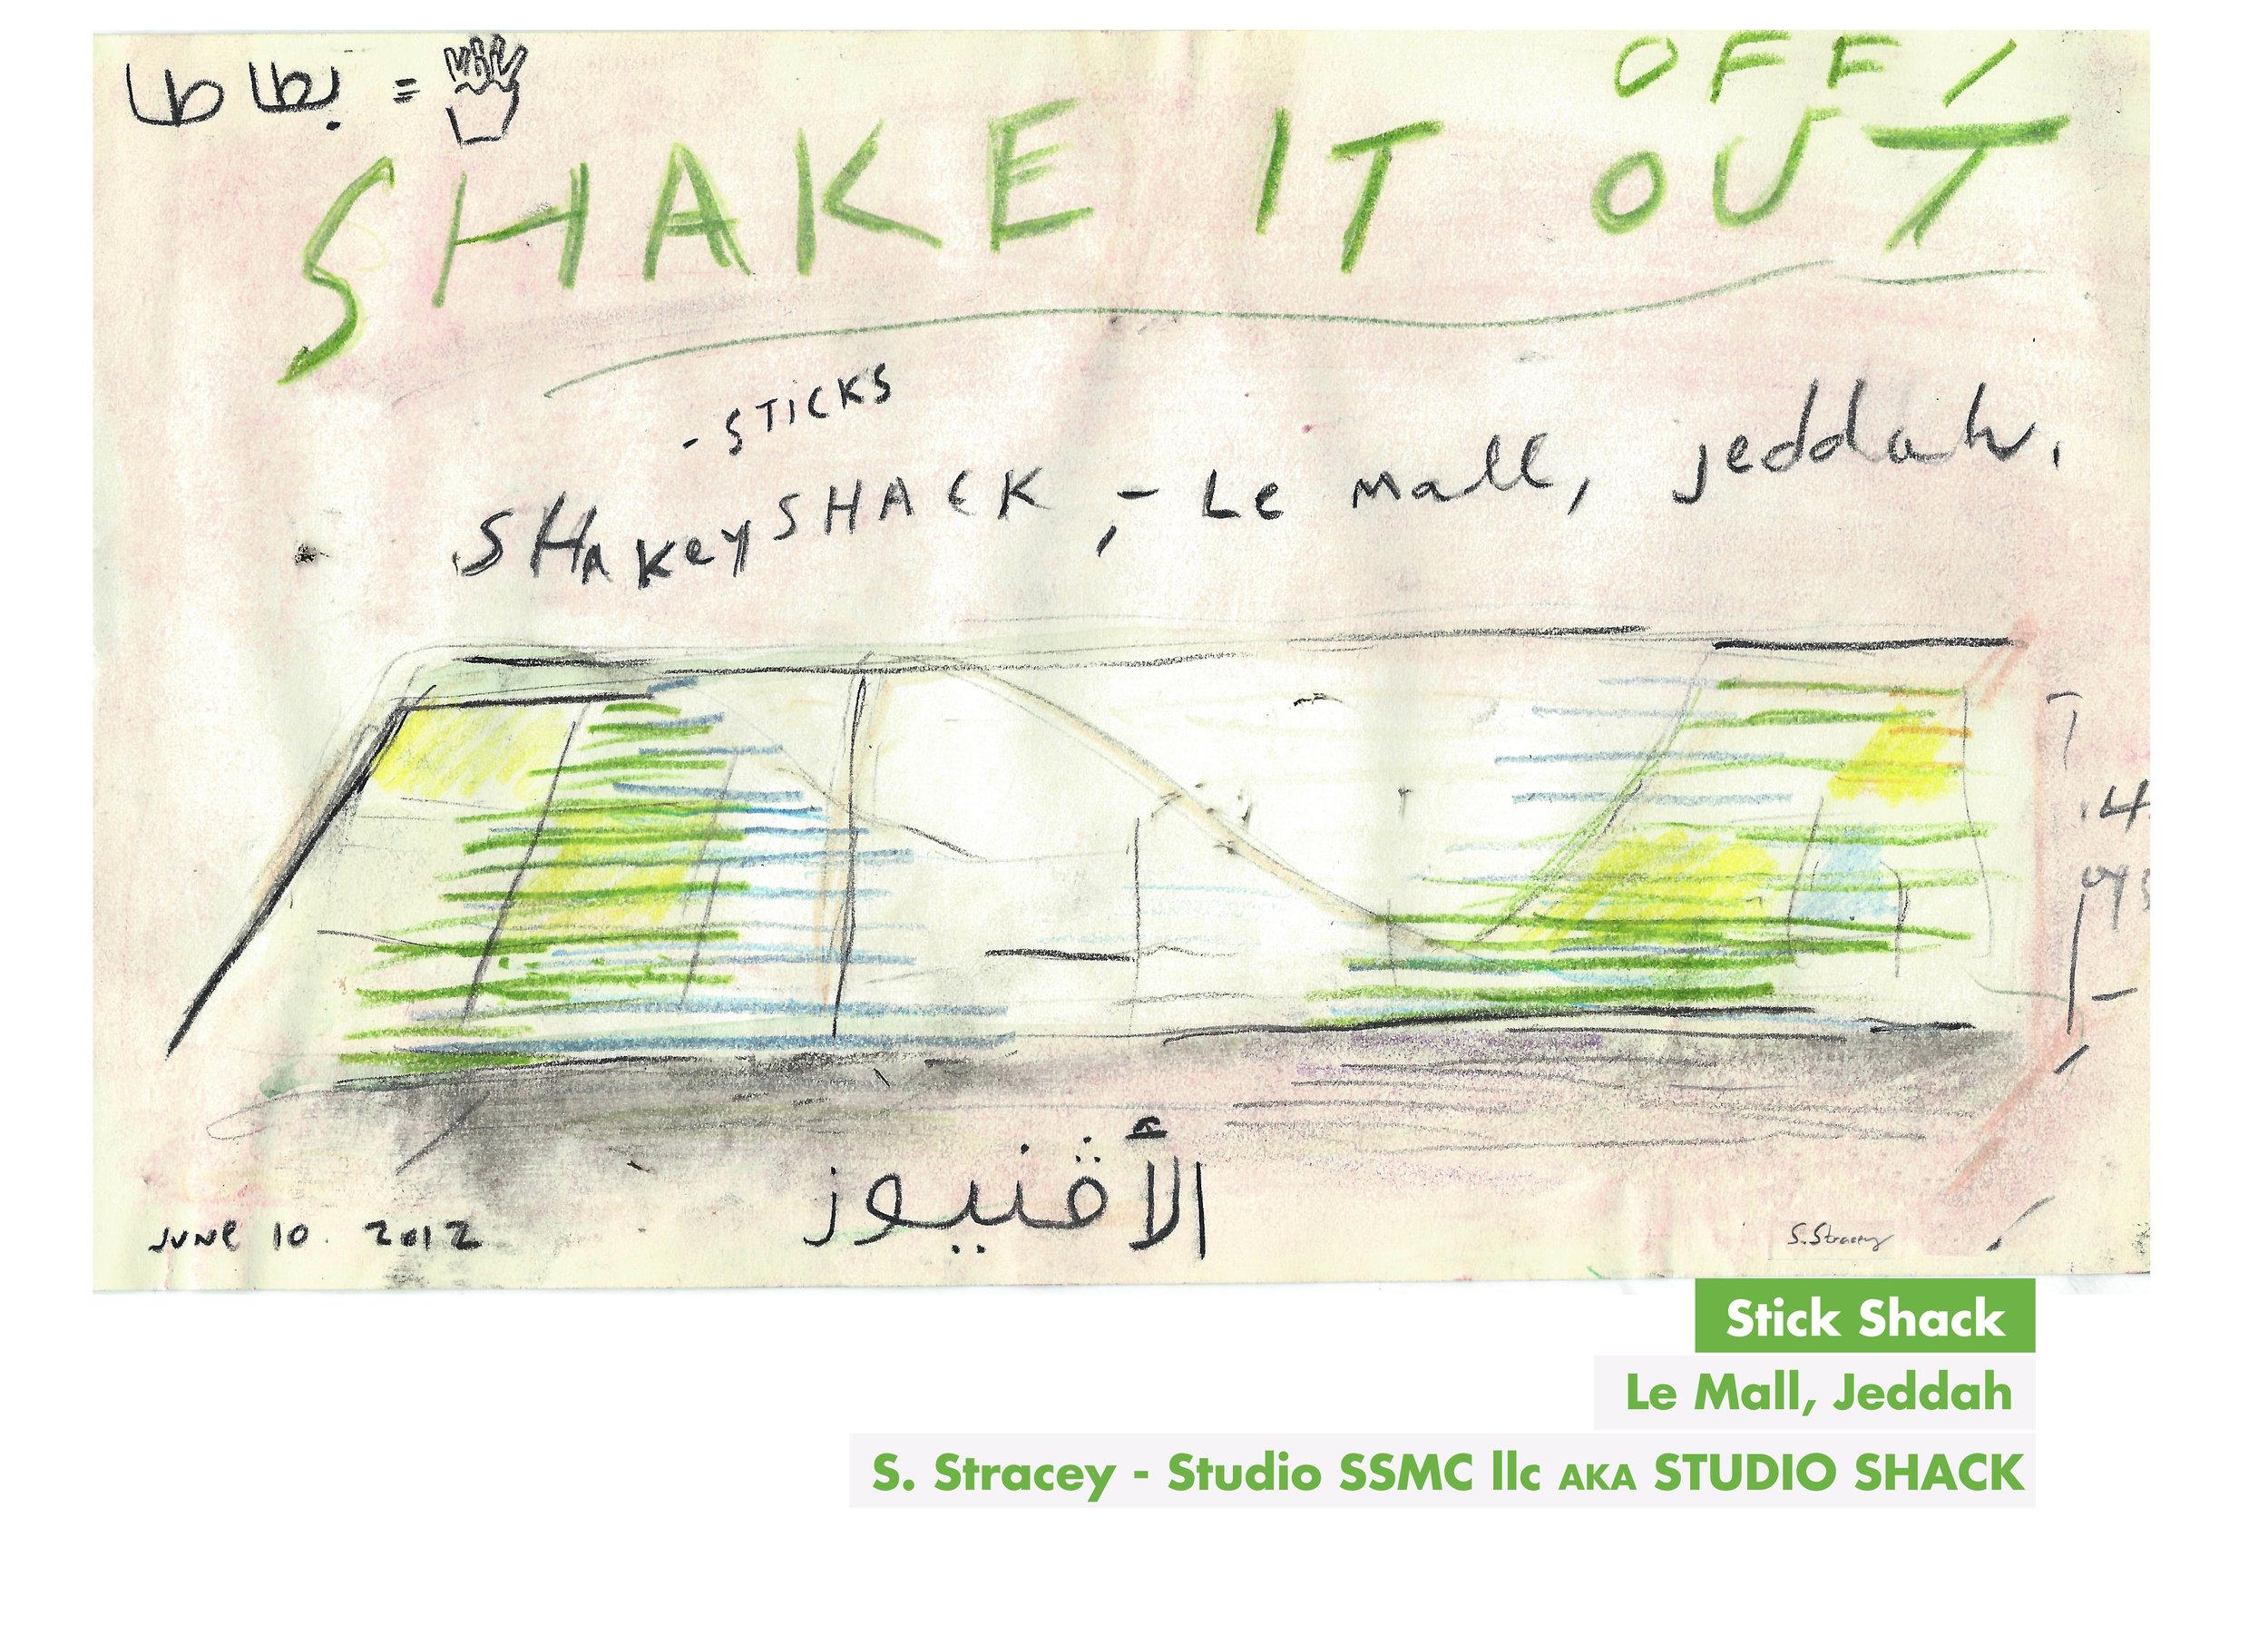 Stick shack, jeddah.jpg